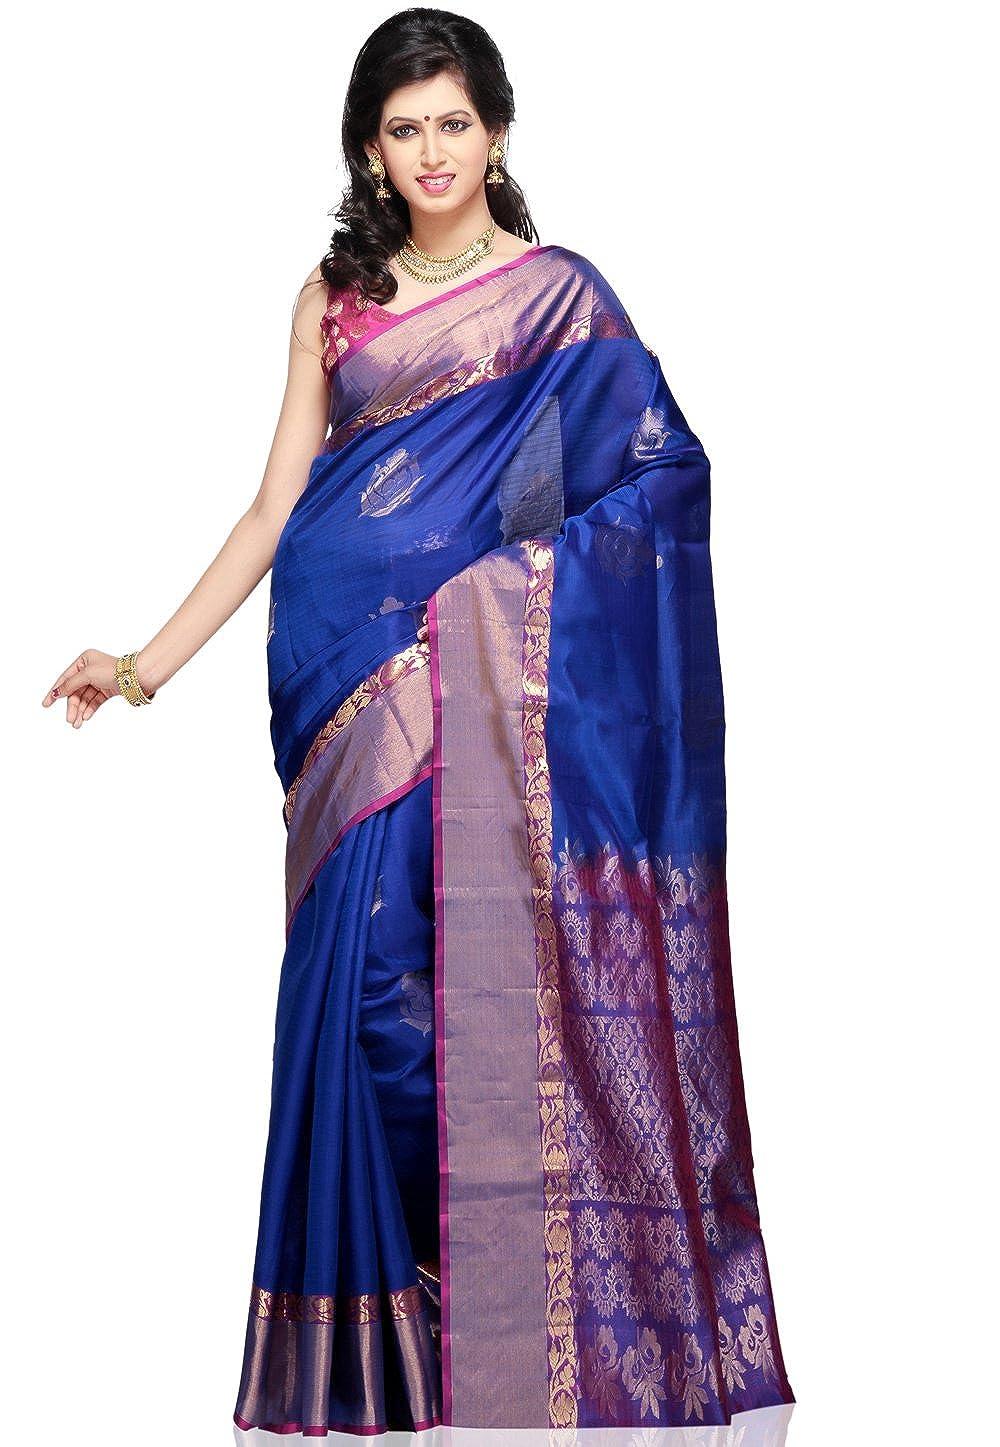 c7e4a62dc47504 Utsav Fashion Women's Dark Blue Pure Kanchipuram Handloom Silk Saree with  Blouse: Amazon.in: Clothing & Accessories